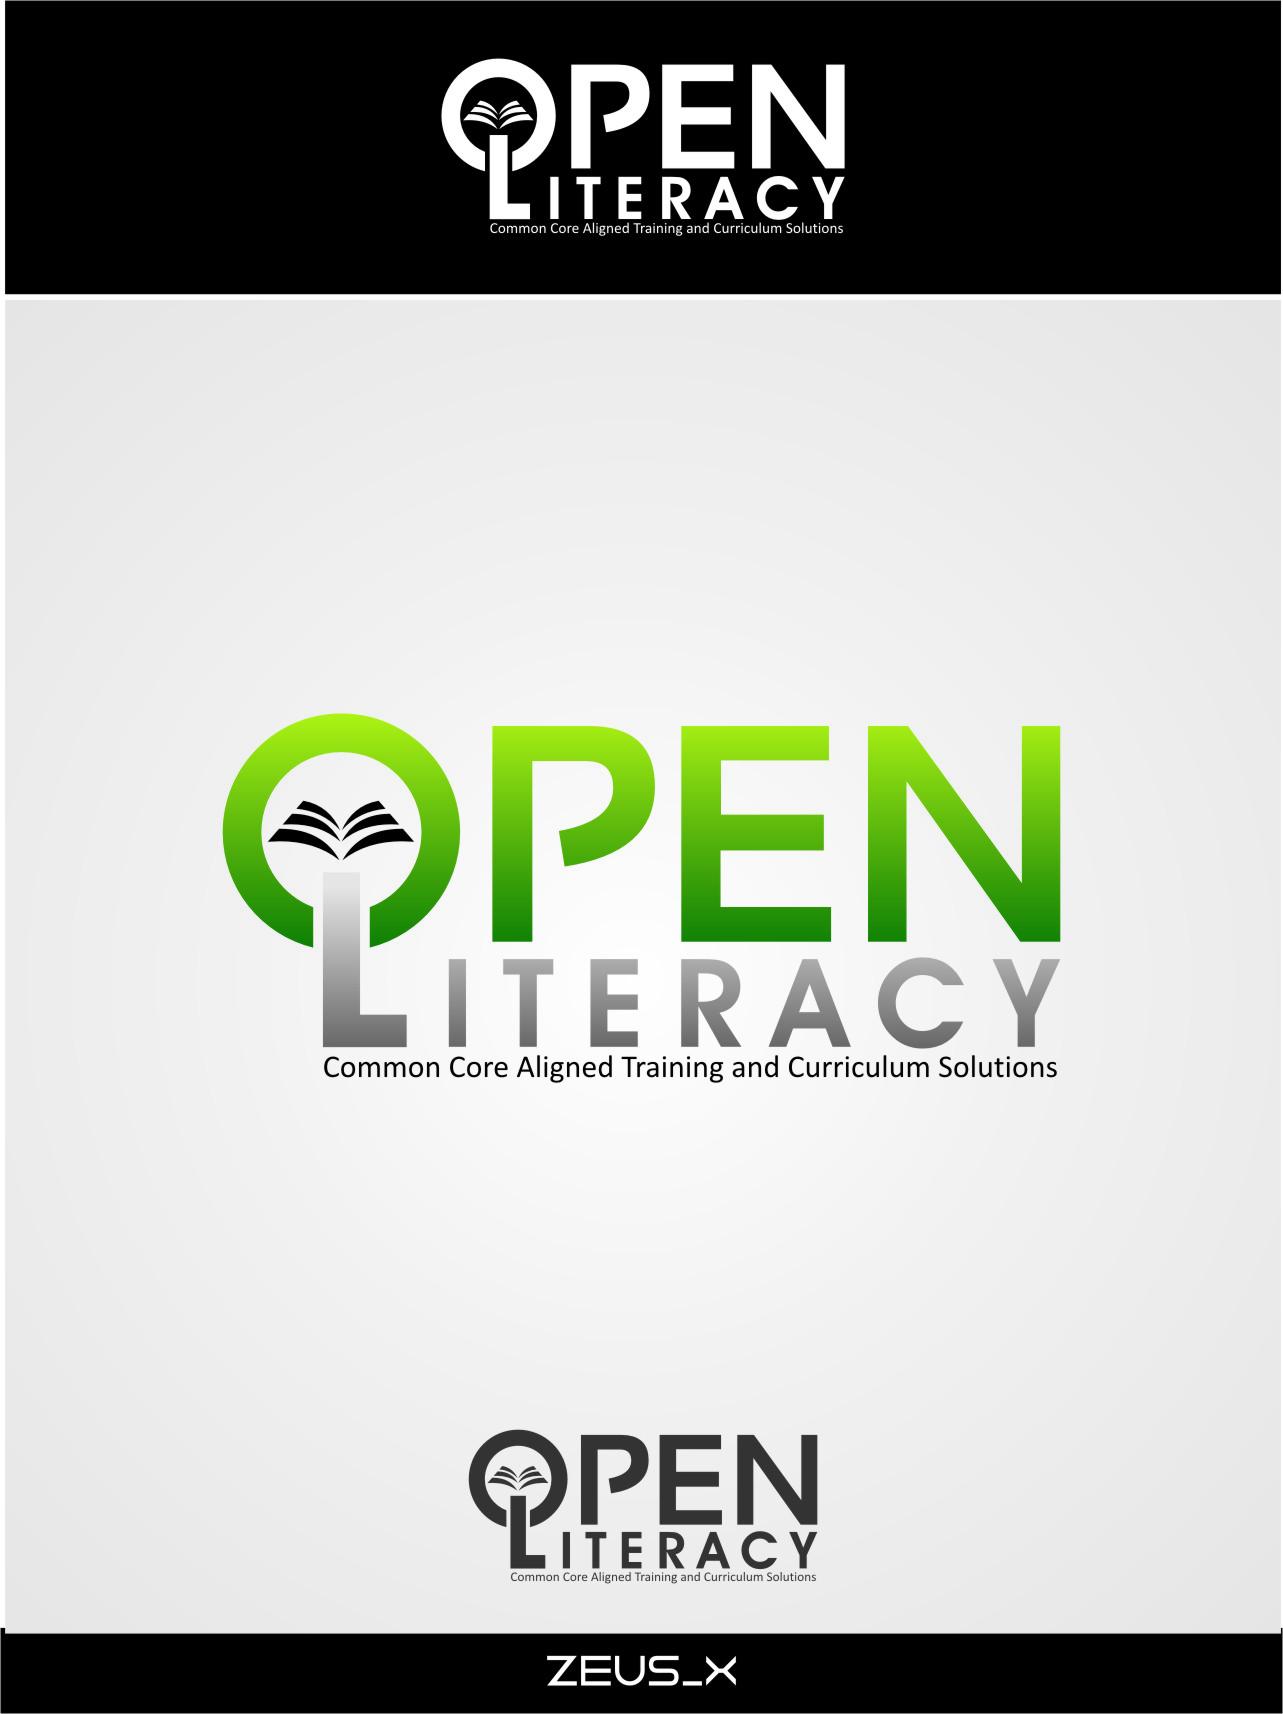 Logo Design by Ngepet_art - Entry No. 124 in the Logo Design Contest Inspiring Logo Design for OpenLiteracy.